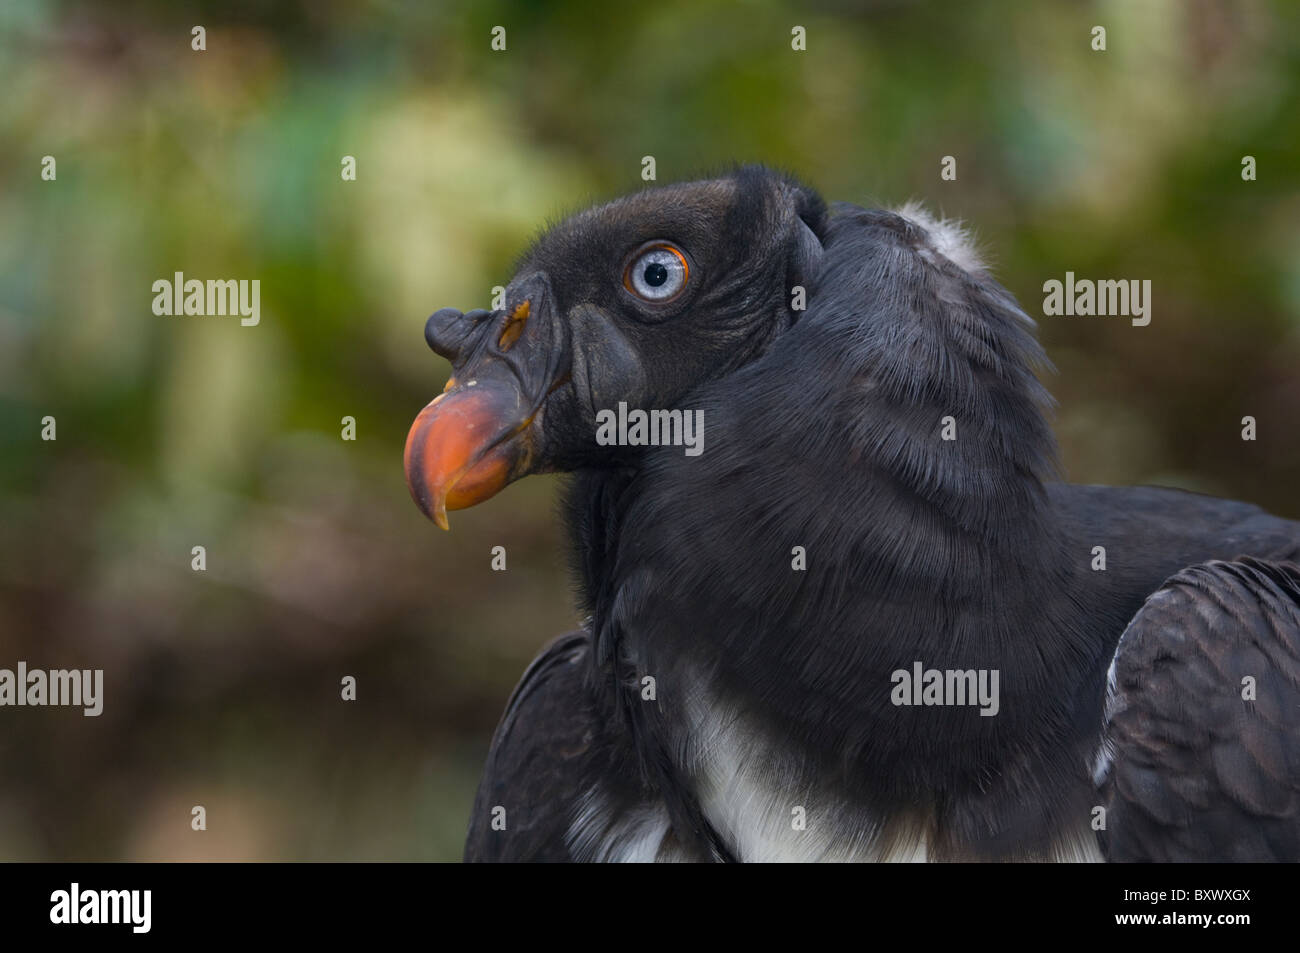 King Vulture (Sarcoramphus Papa), Welt der Vögel, Kapstadt, Südafrika Stockbild